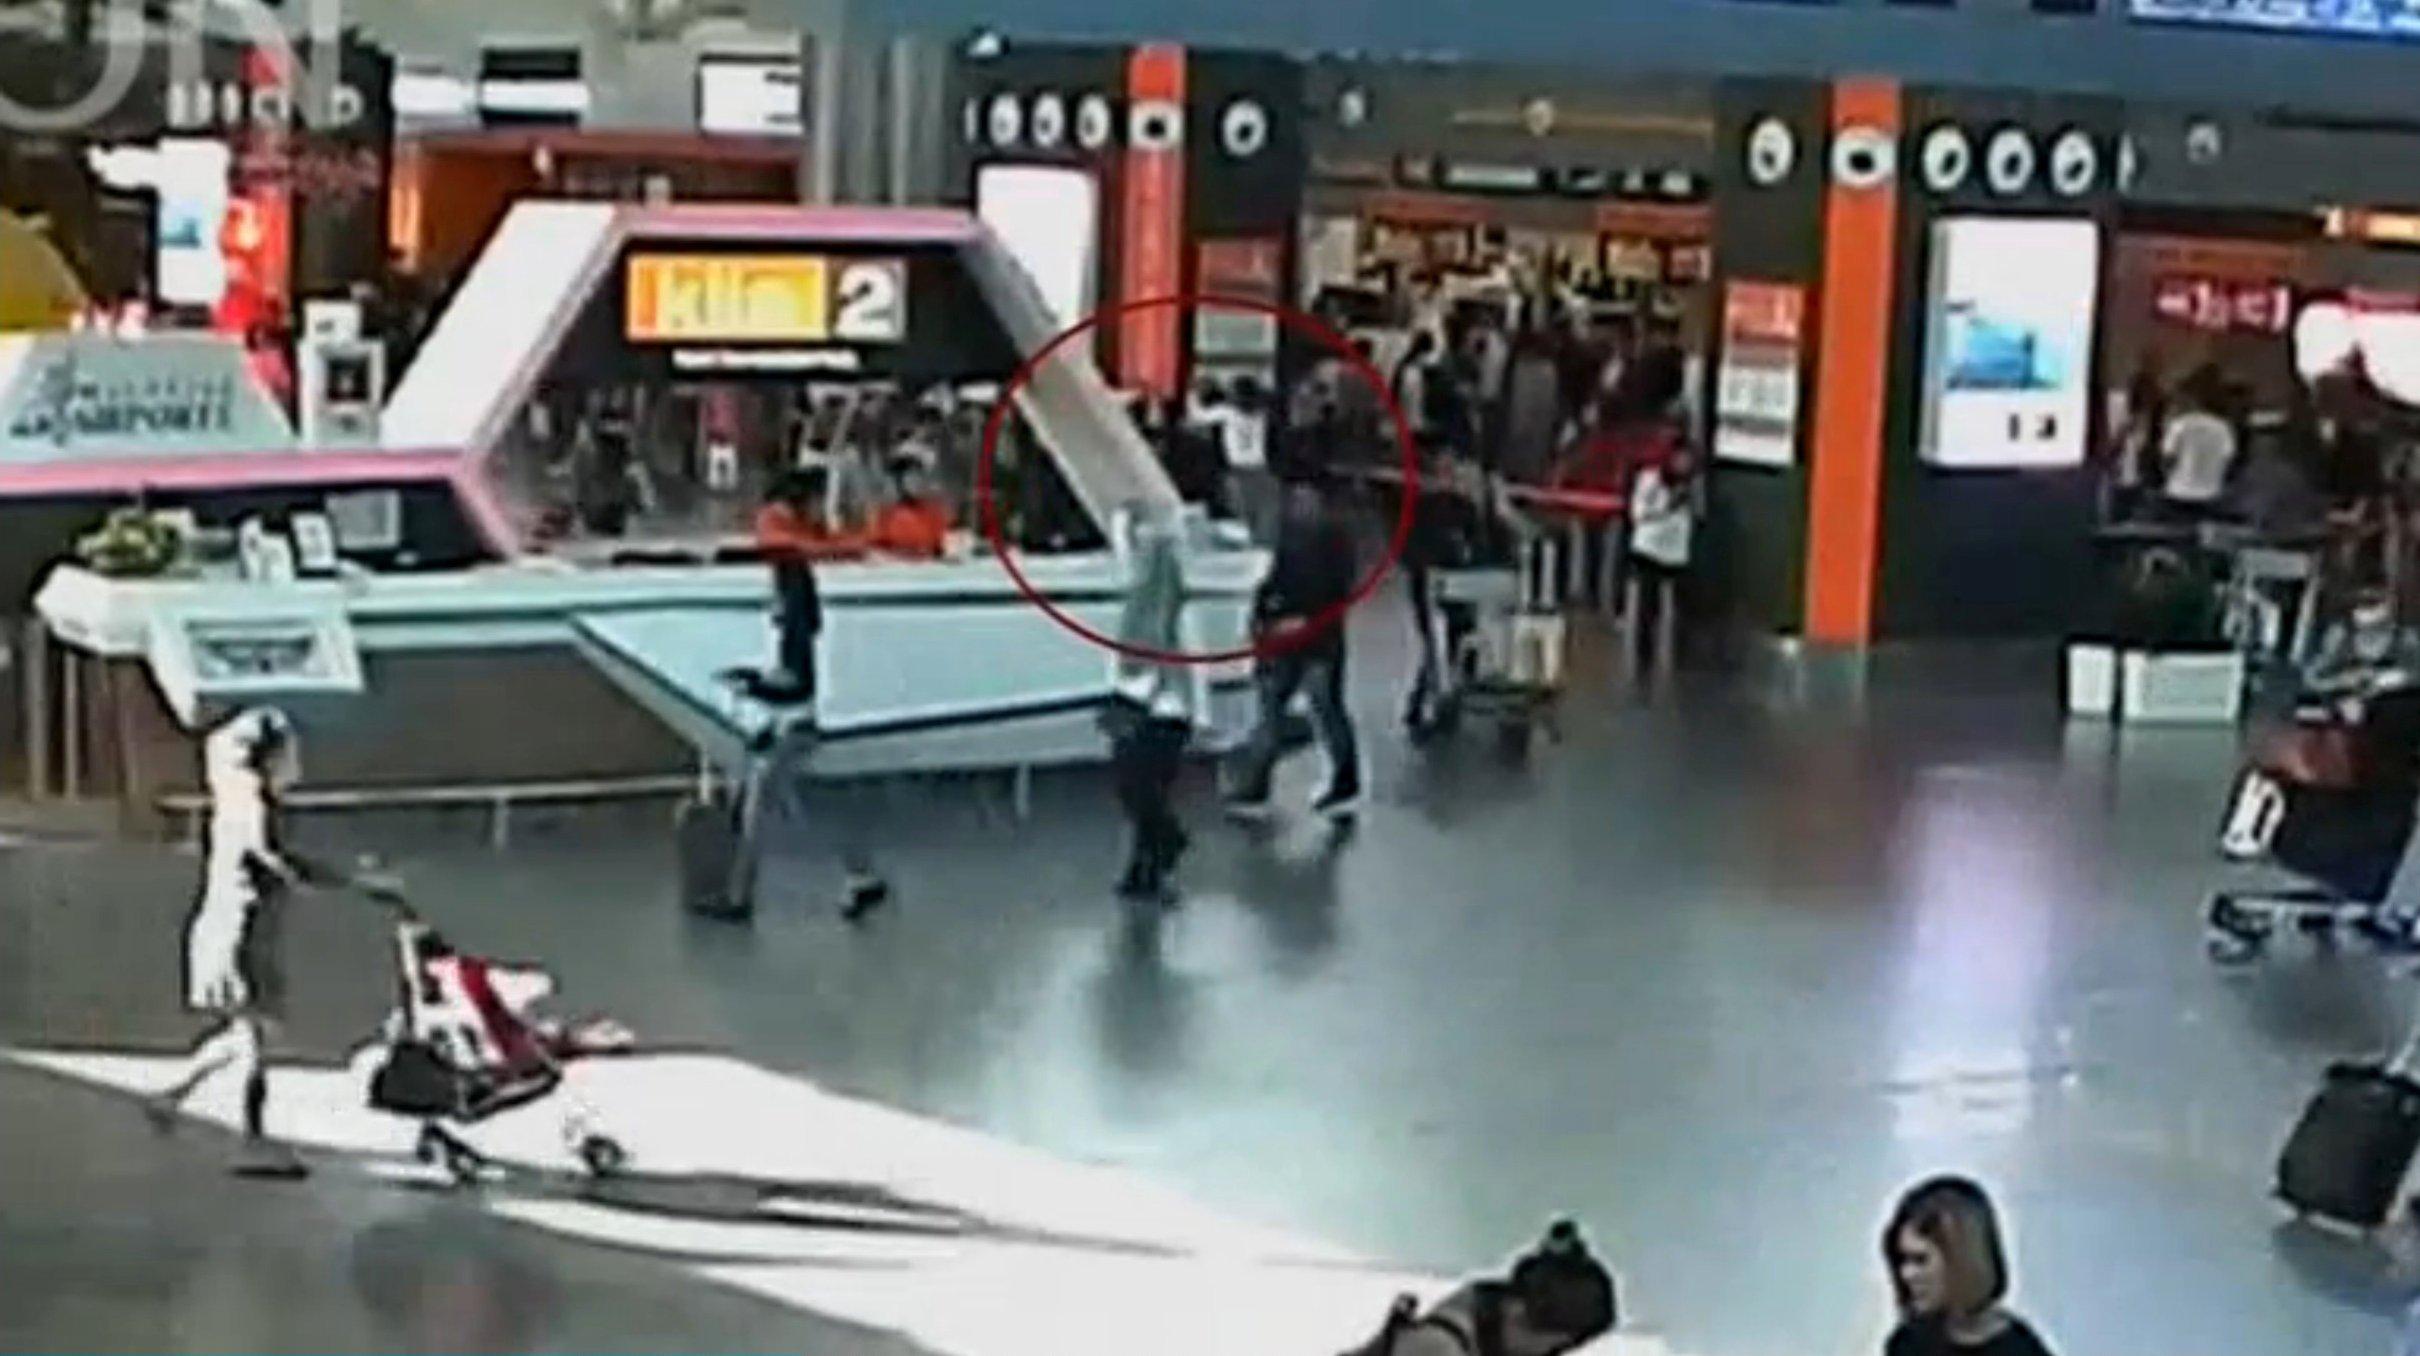 Airport Killing, Diplomatic Spat Could Cost N. Korea a Rare Friend